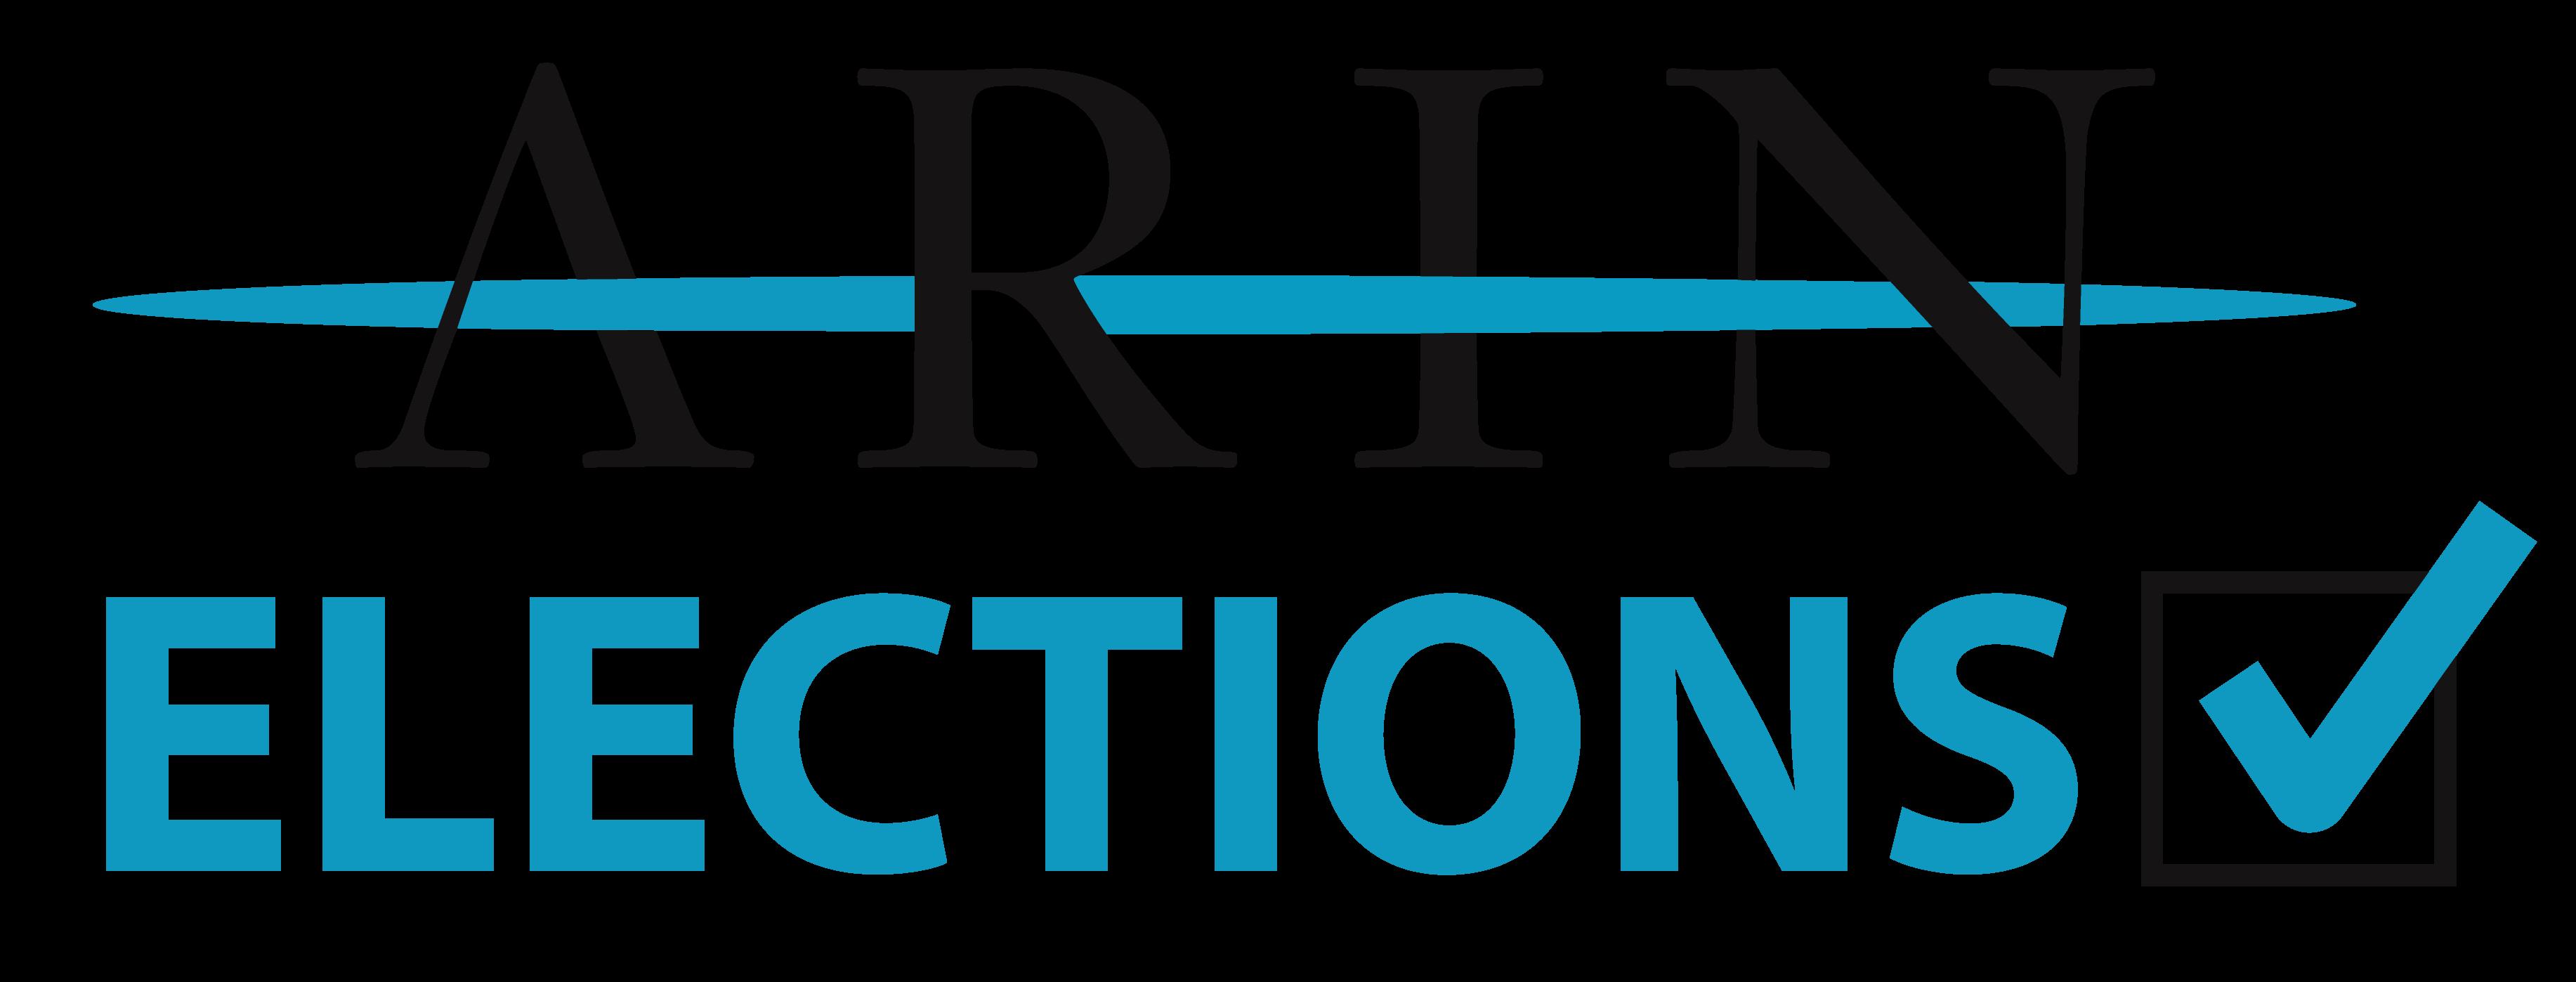 ARIN Elections (logo)